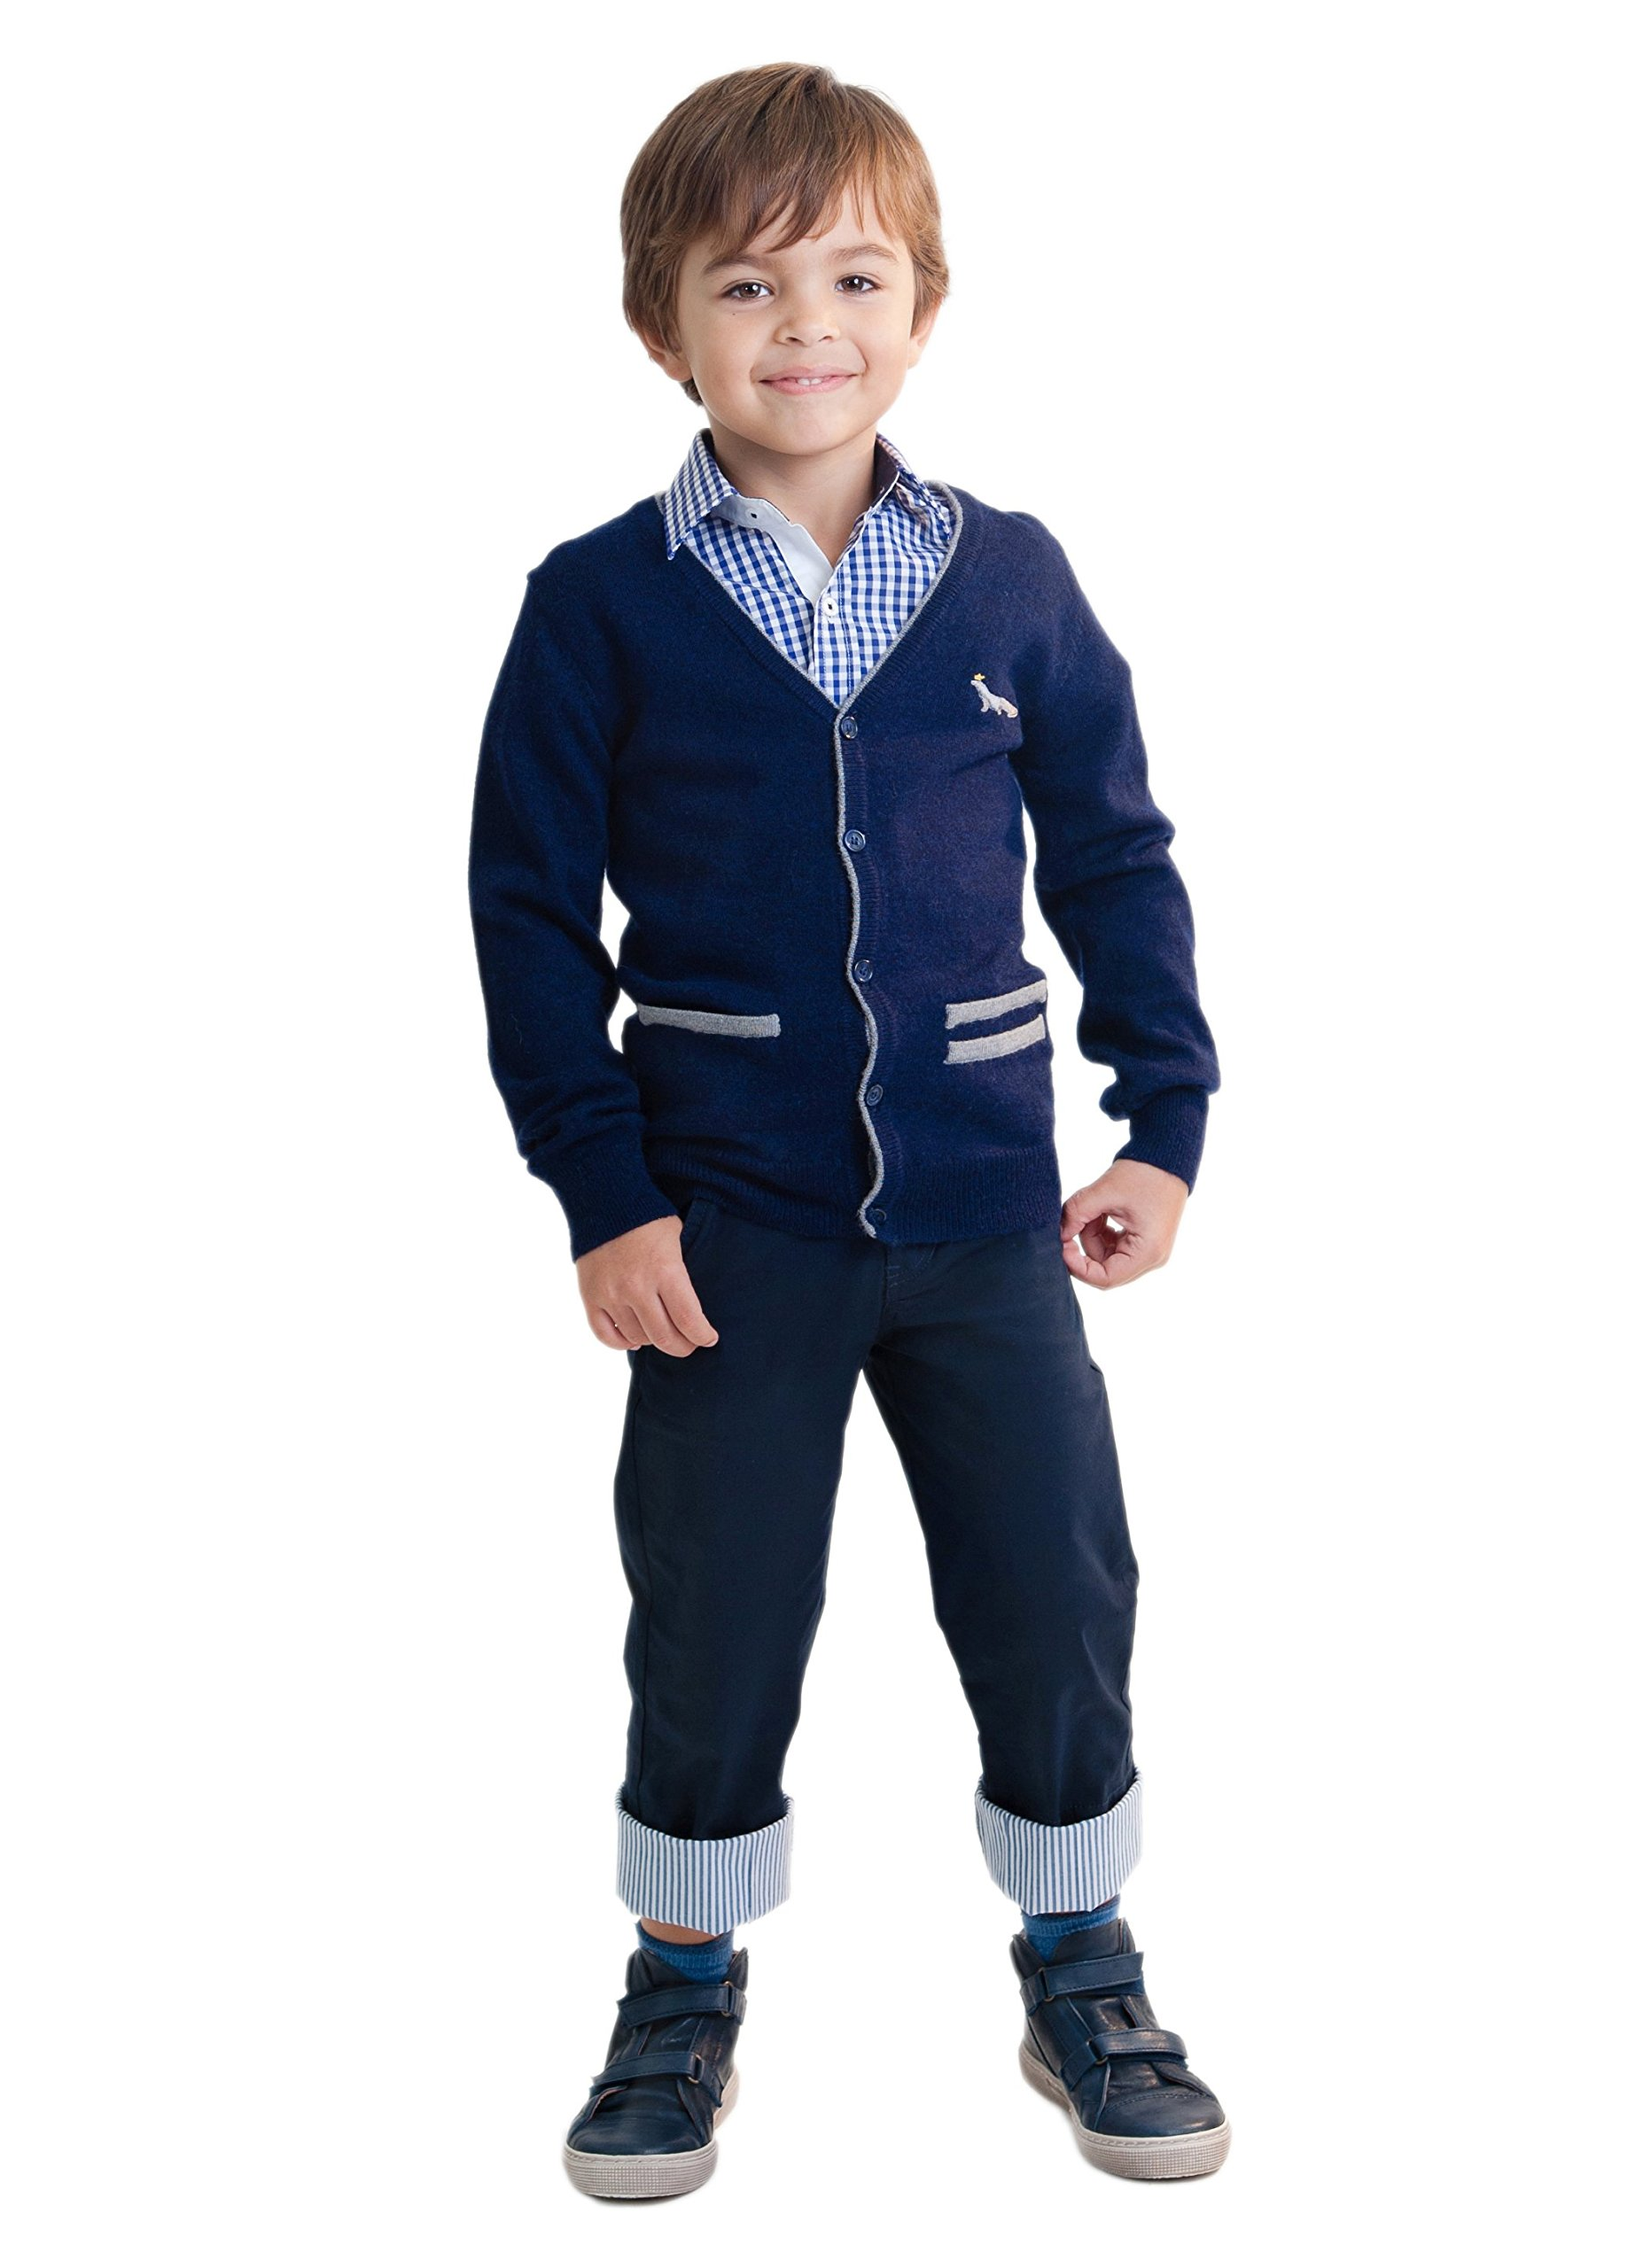 Dakomoda Toddler Boy's Blue Cashmere Wool Blend Cardigan Top Fine Knit Navy V-Neck Sweater 5T